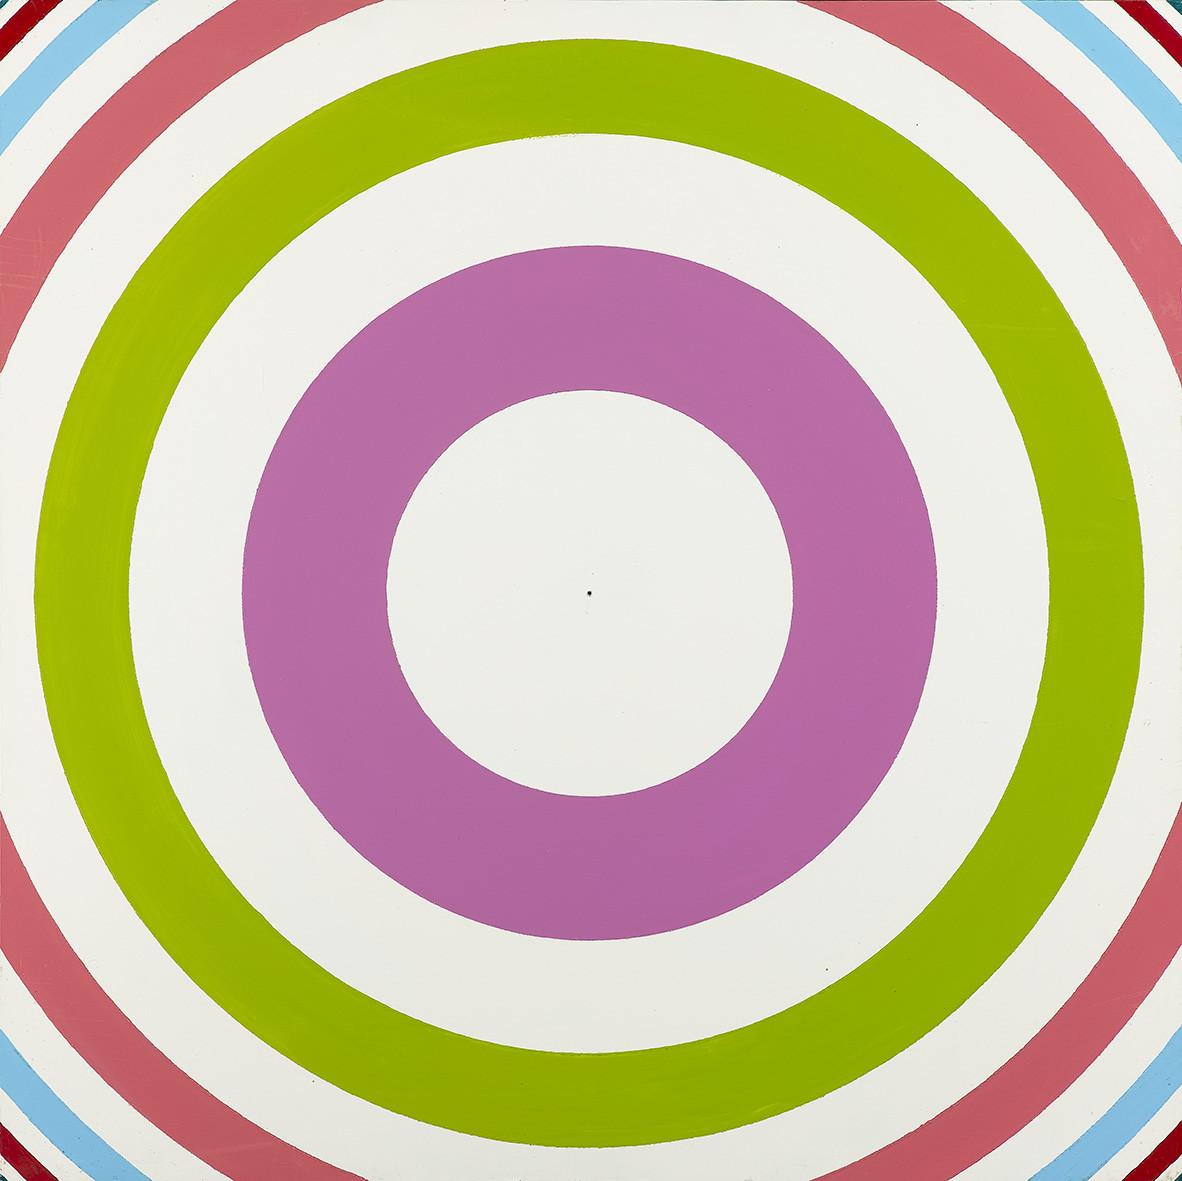 "<span class=""link fancybox-details-link""><a href=""/exhibitions/143/works/artworks11011/"">View Detail Page</a></span><div class=""artist""><strong> Poul Gernes</strong></div><div class=""title""><em>Untitled (Target painting)</em>, 1966-1970</div><div class=""medium"">enamel paint on masonite</div><div class=""dimensions"">91.0 x 91.0 cm<br>35 13/16 x 35 13/16 in</div>"